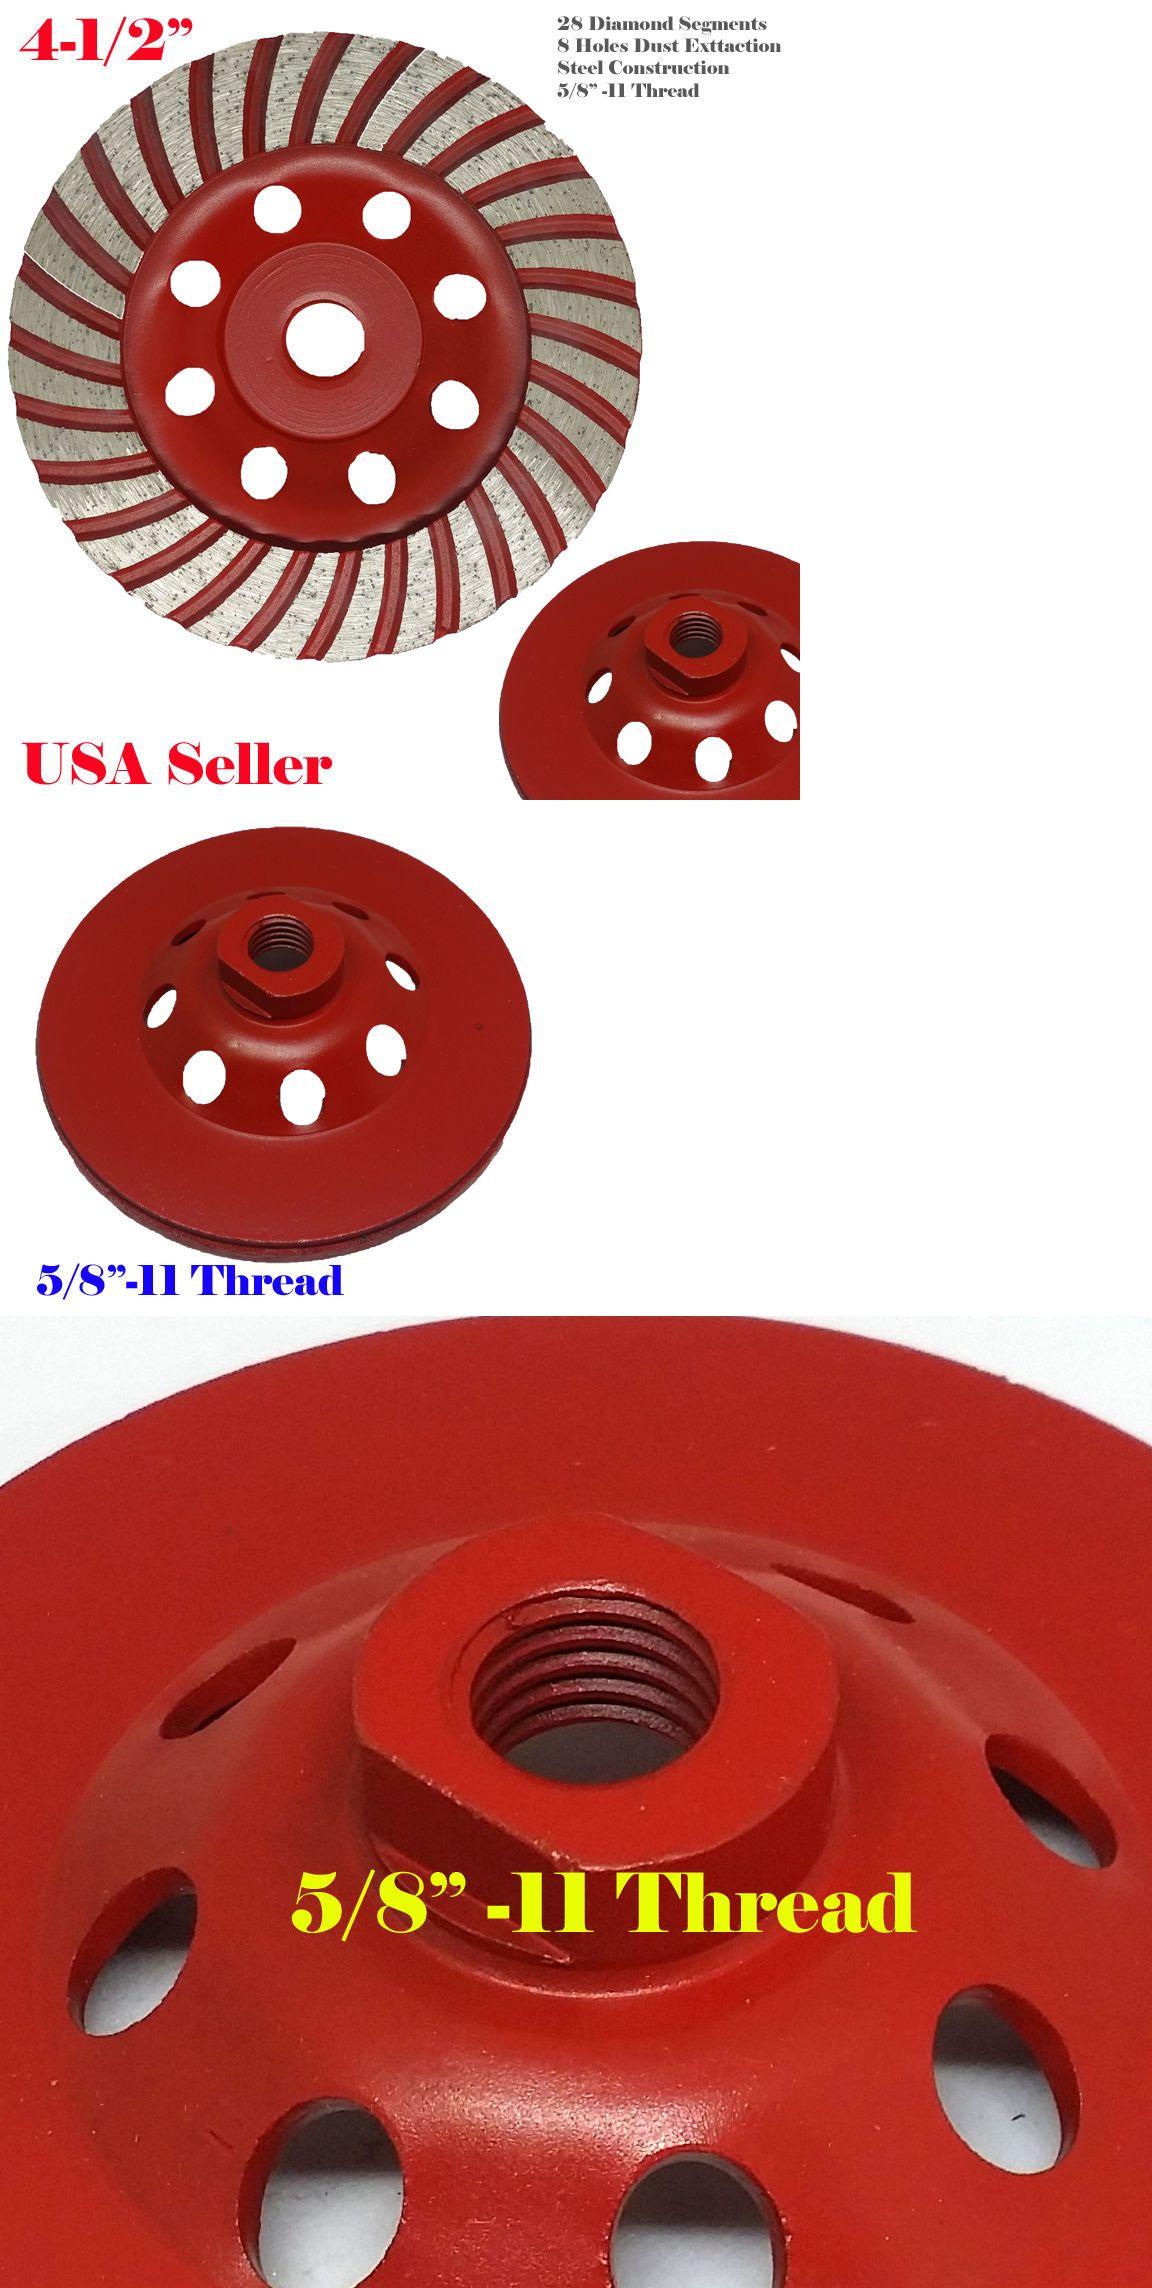 4 5 5 8 11 Thread Diamond Grinding Cup Wheel Disc Grinder Concrete 28 Segments Concrete Grinder Concrete Grinder